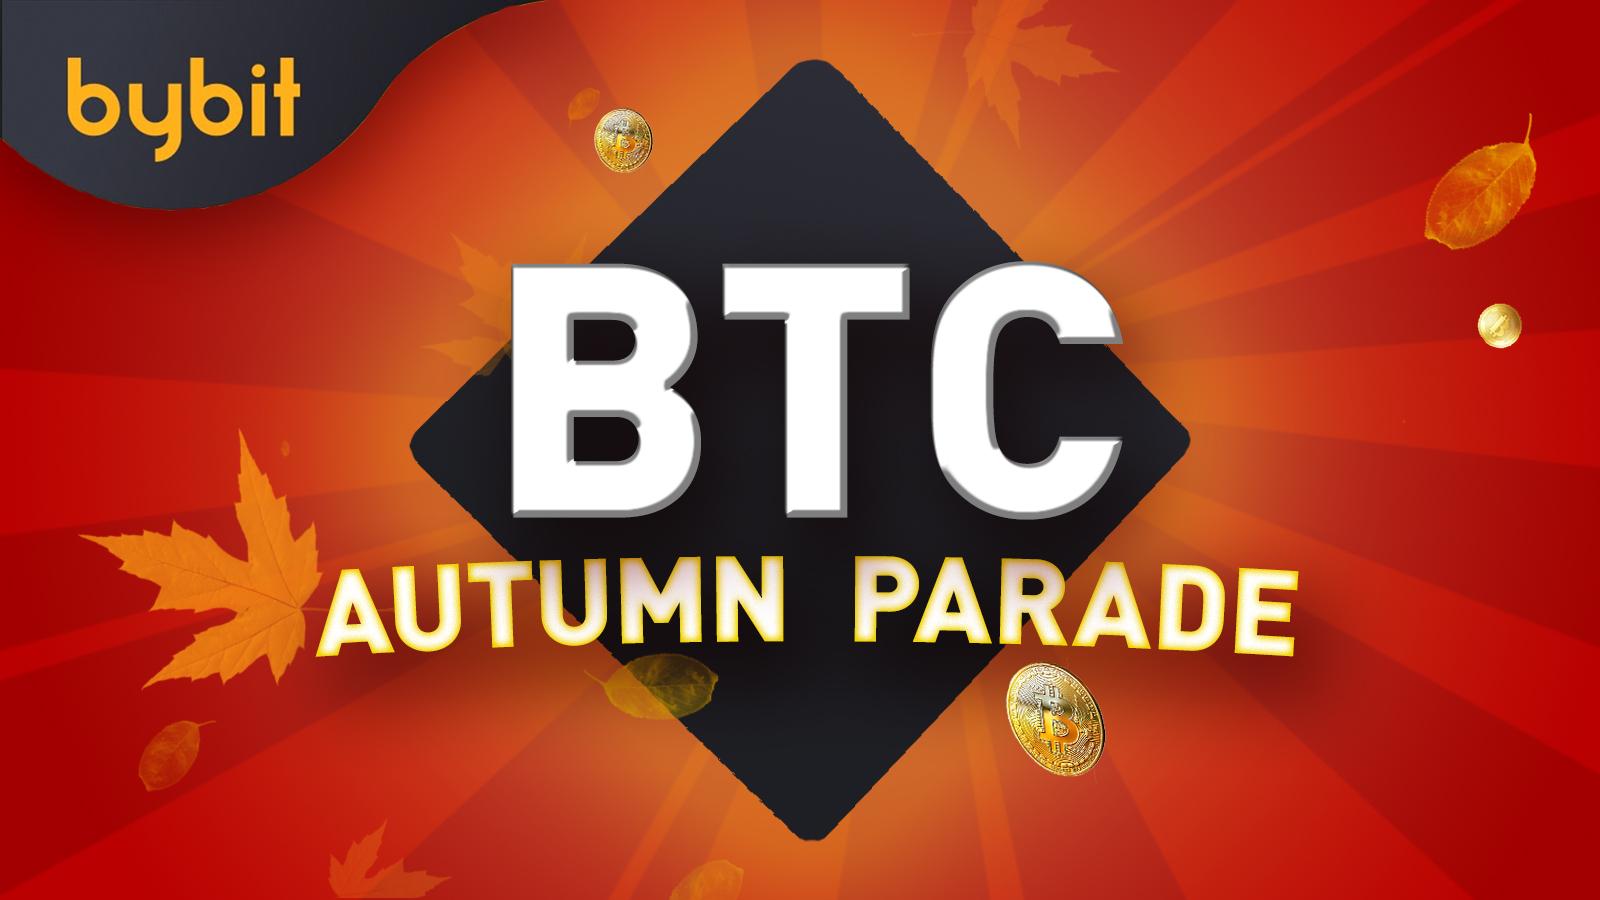 Autumn BTC Parade